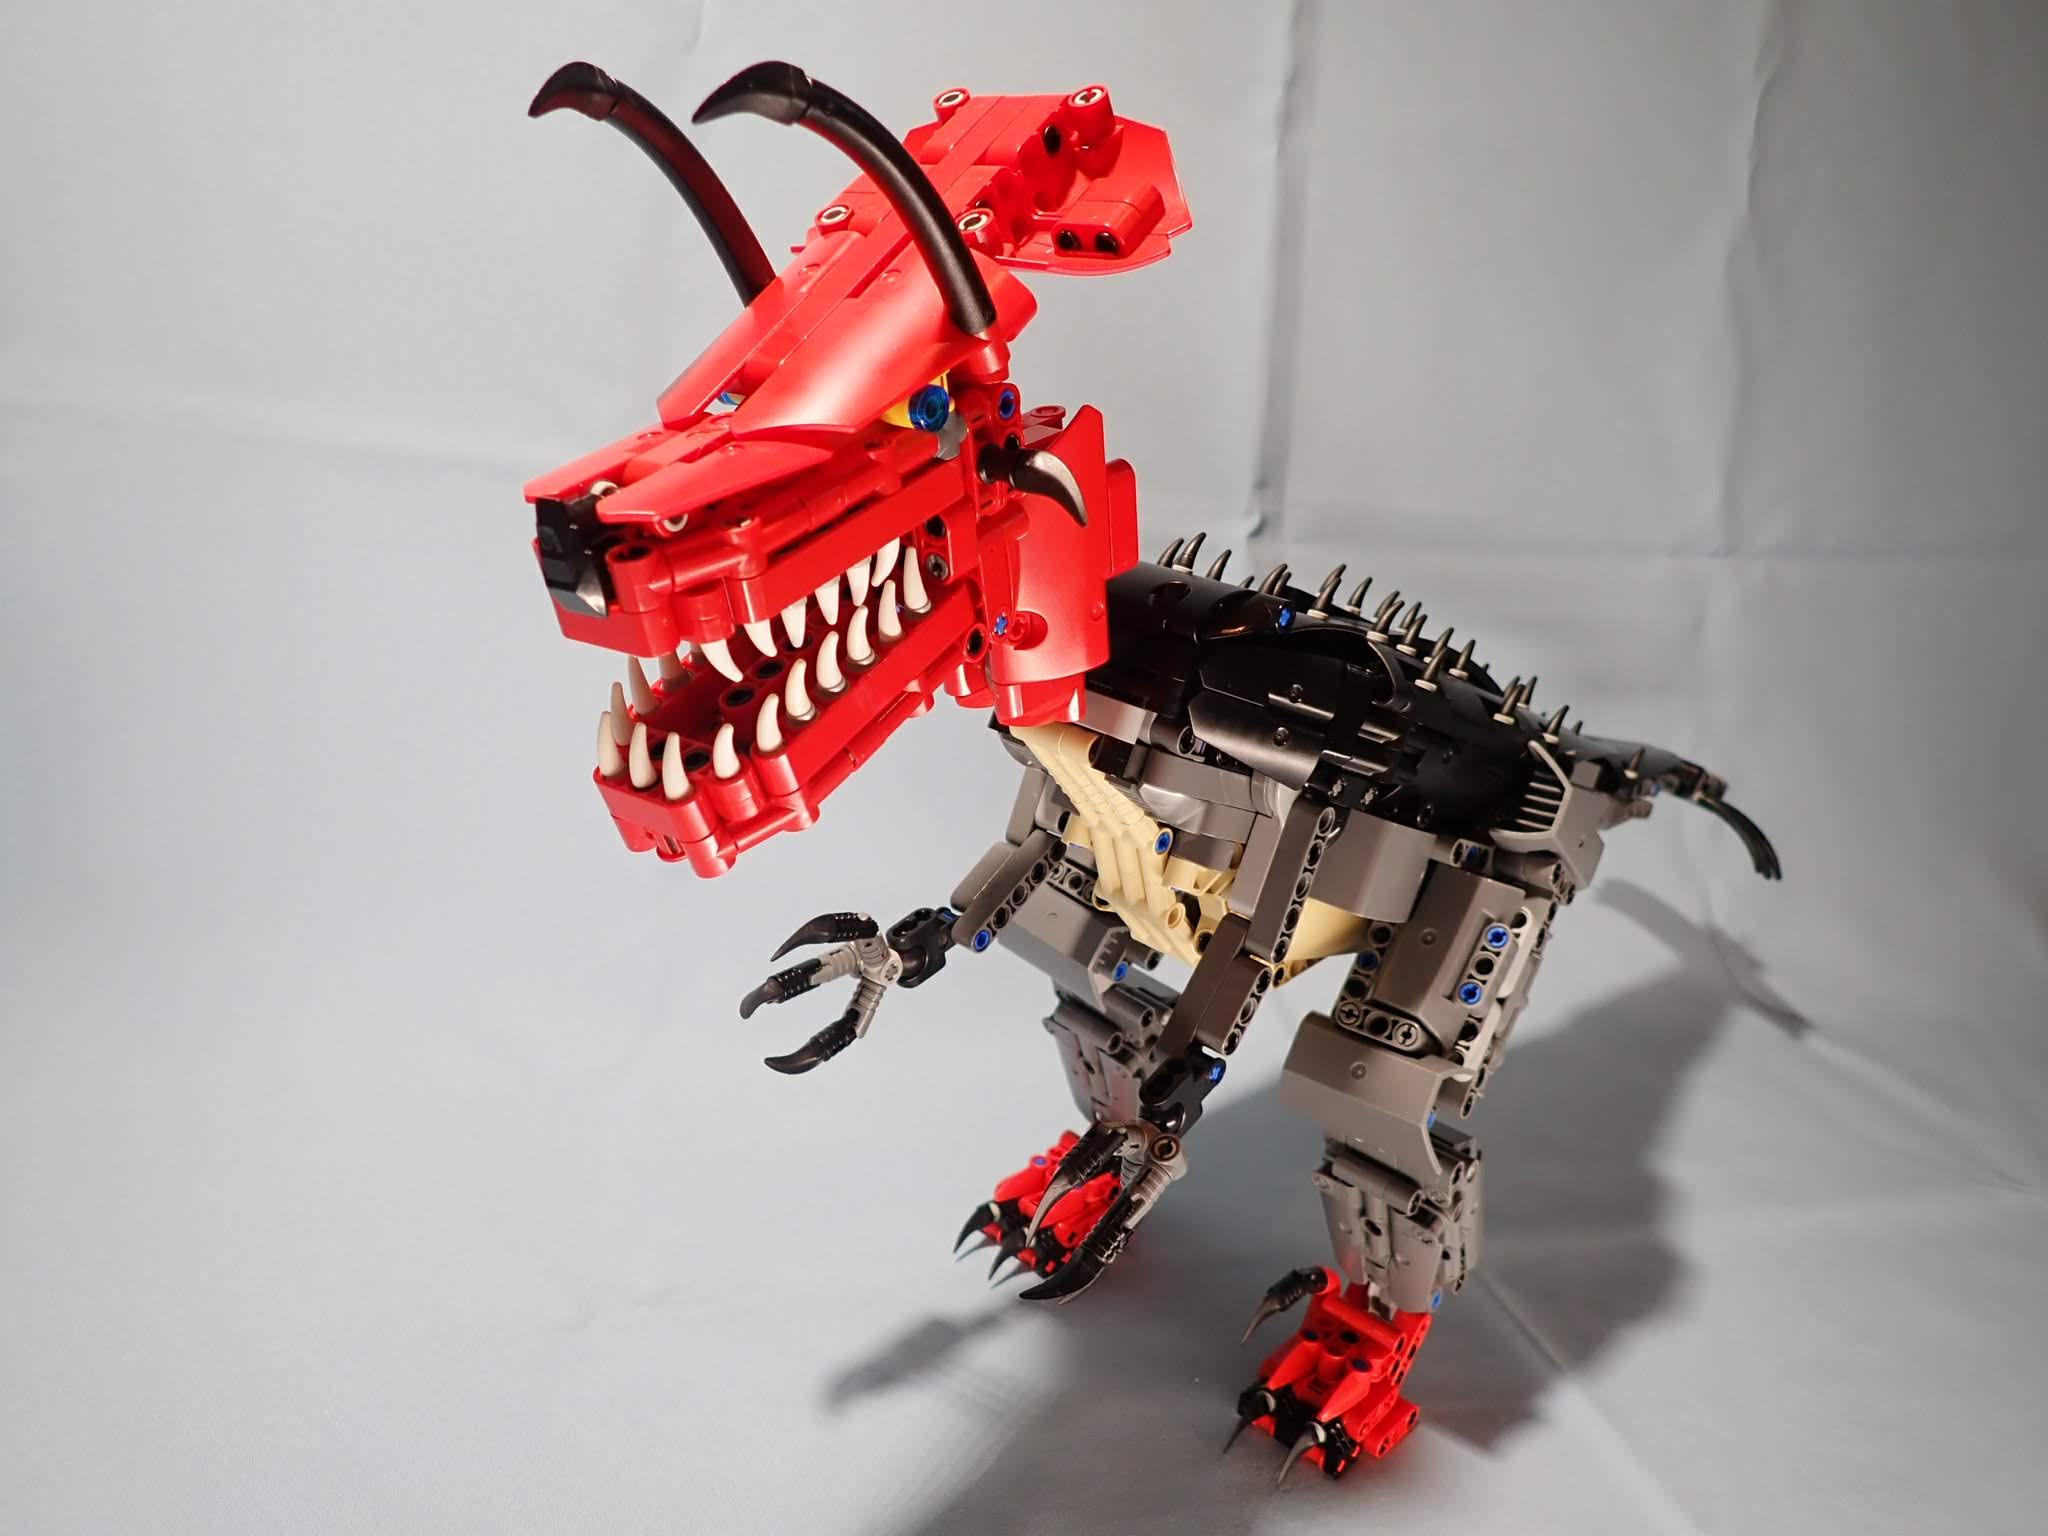 LEGO® MOC by braker23: Ultimasaurus